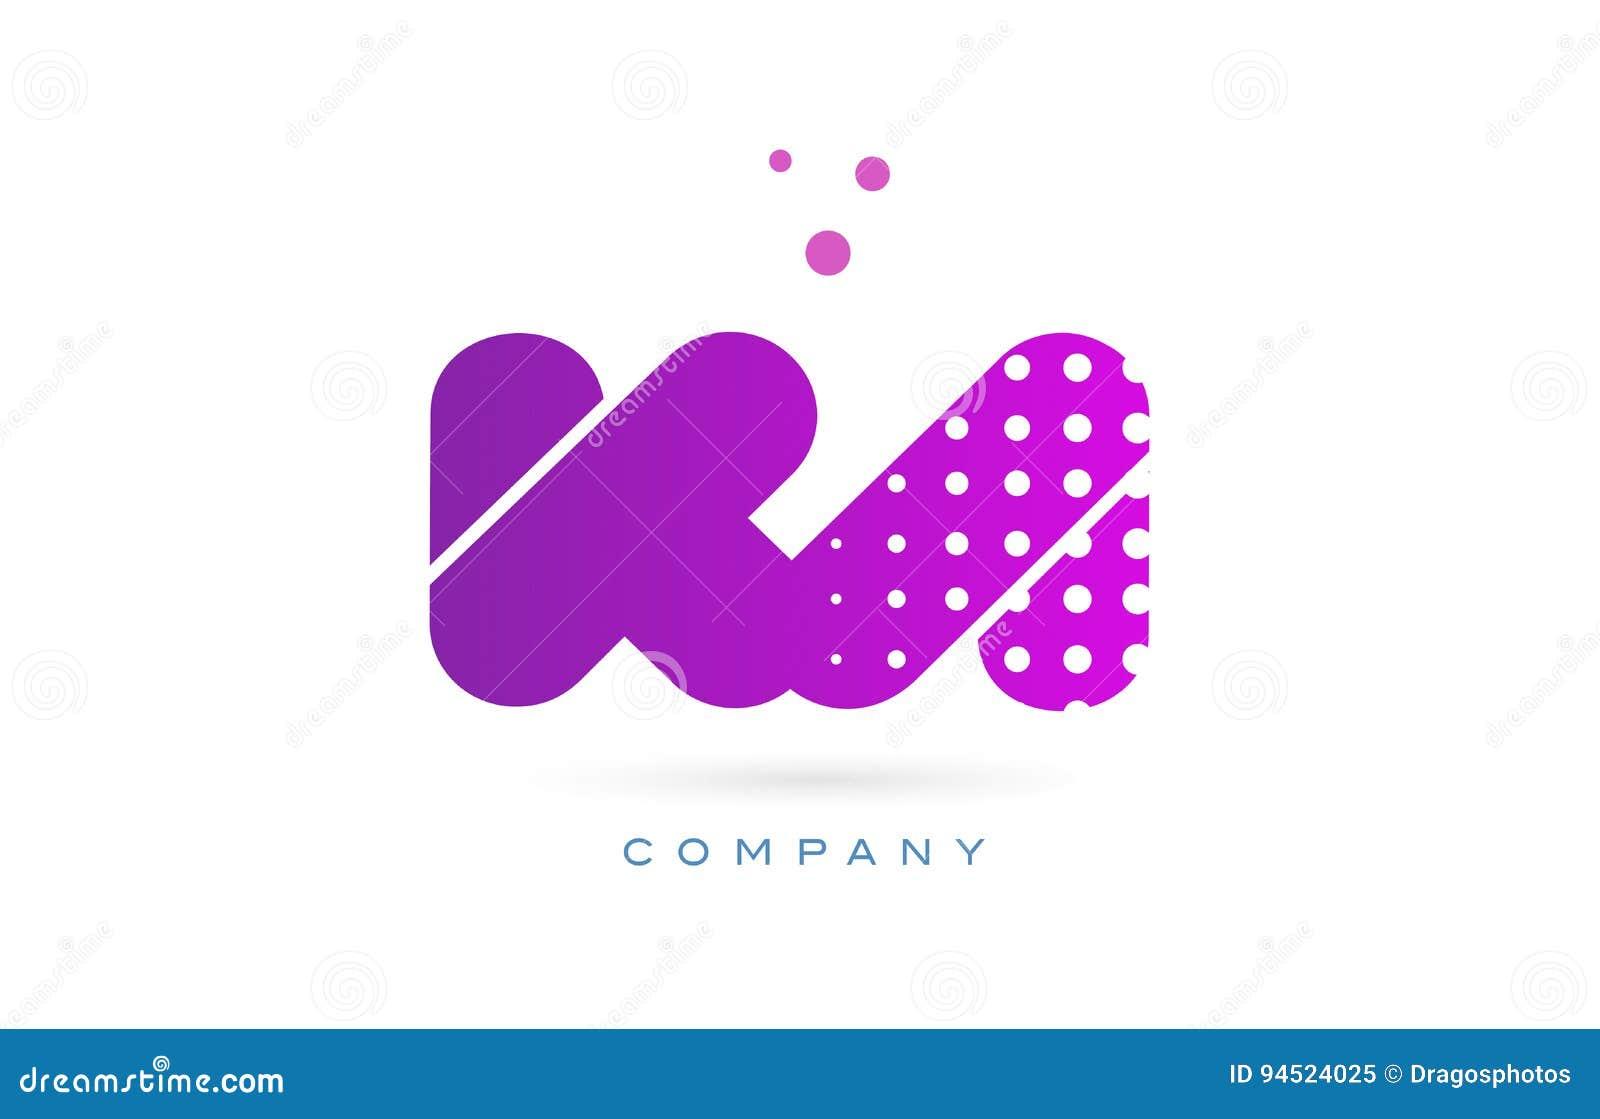 ka k a pink dots letter logo alphabet icon stock vector